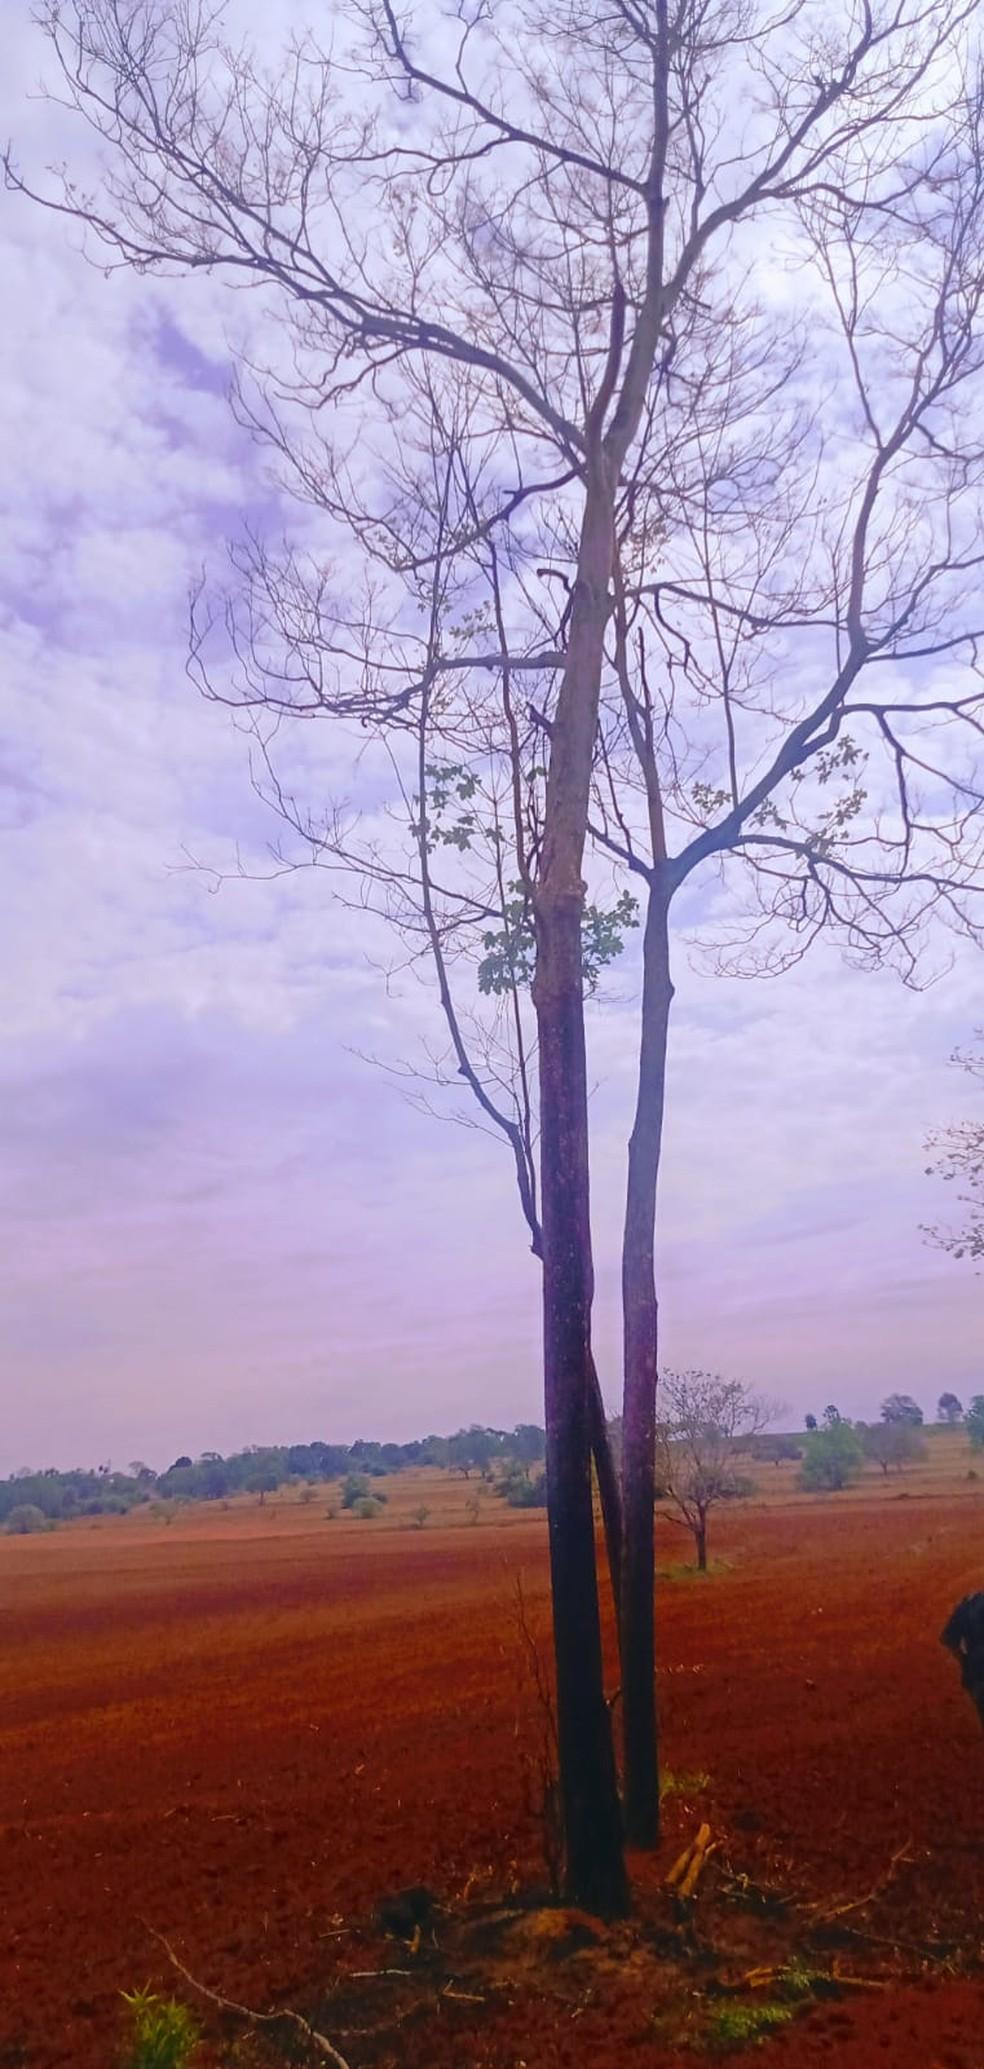 Árvore danificada pelo fogo rendeu advertência a sitiante — Foto: Polícia Militar Ambiental